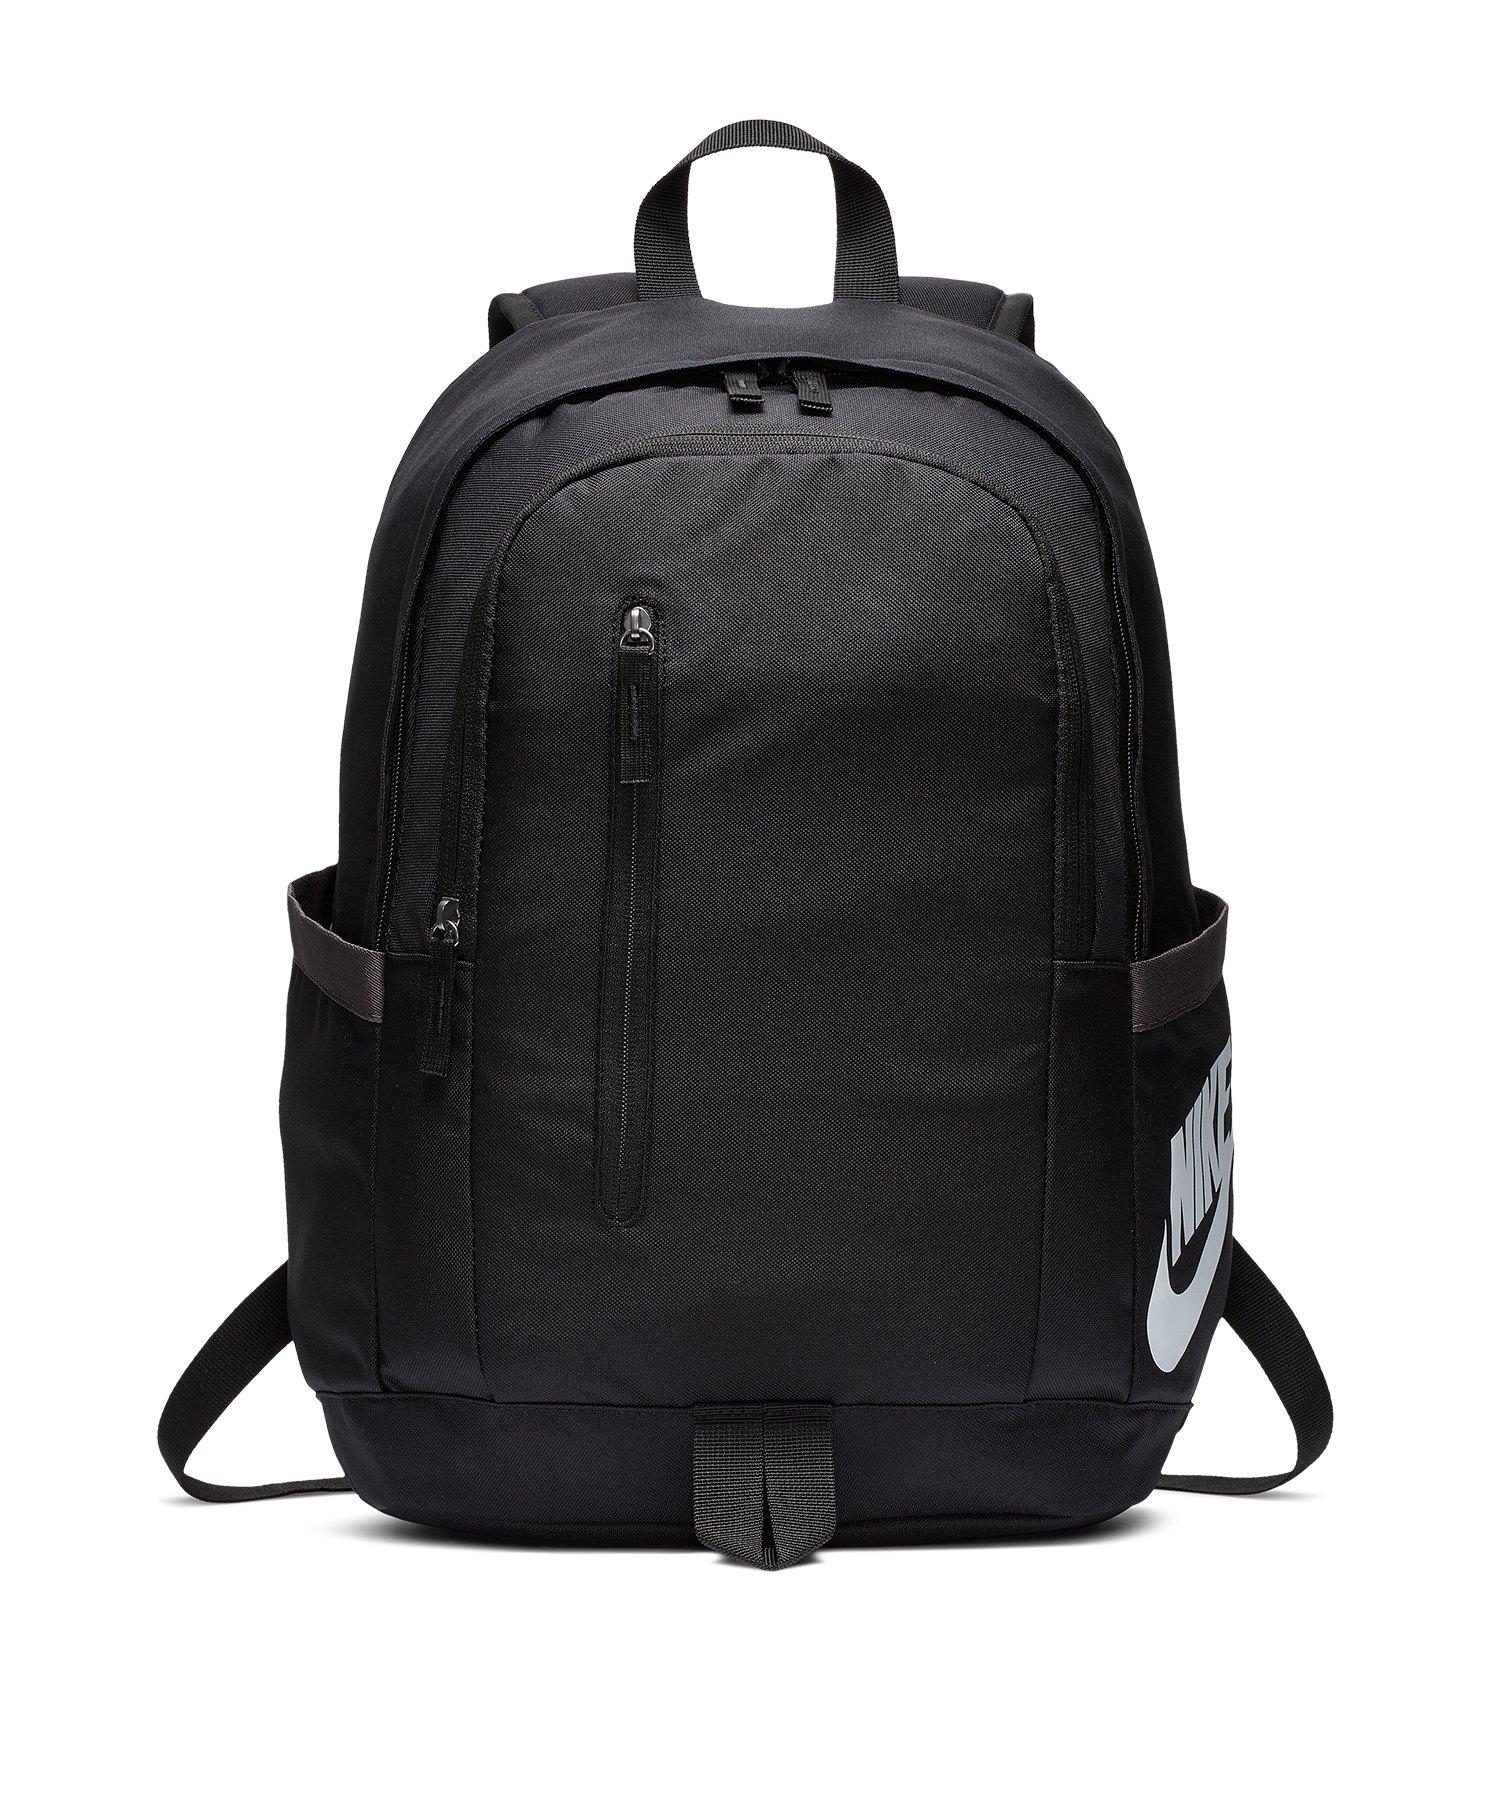 Nike All Access Soleday Backpack Rucksack F013